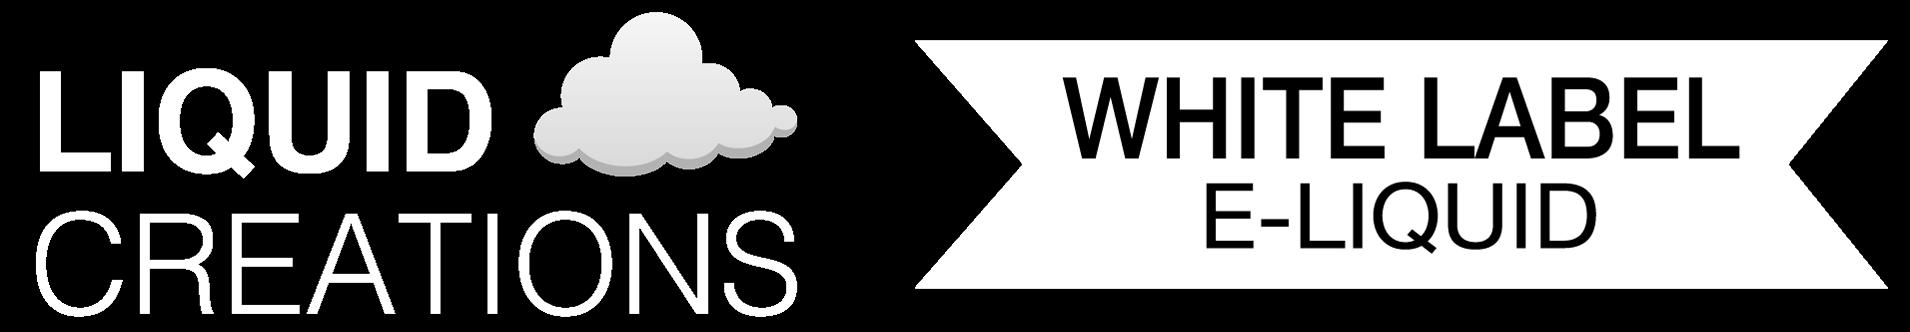 E-Liquid-Manufacturer-UK-White-Label-E-Liquid-UK-Banner-Image